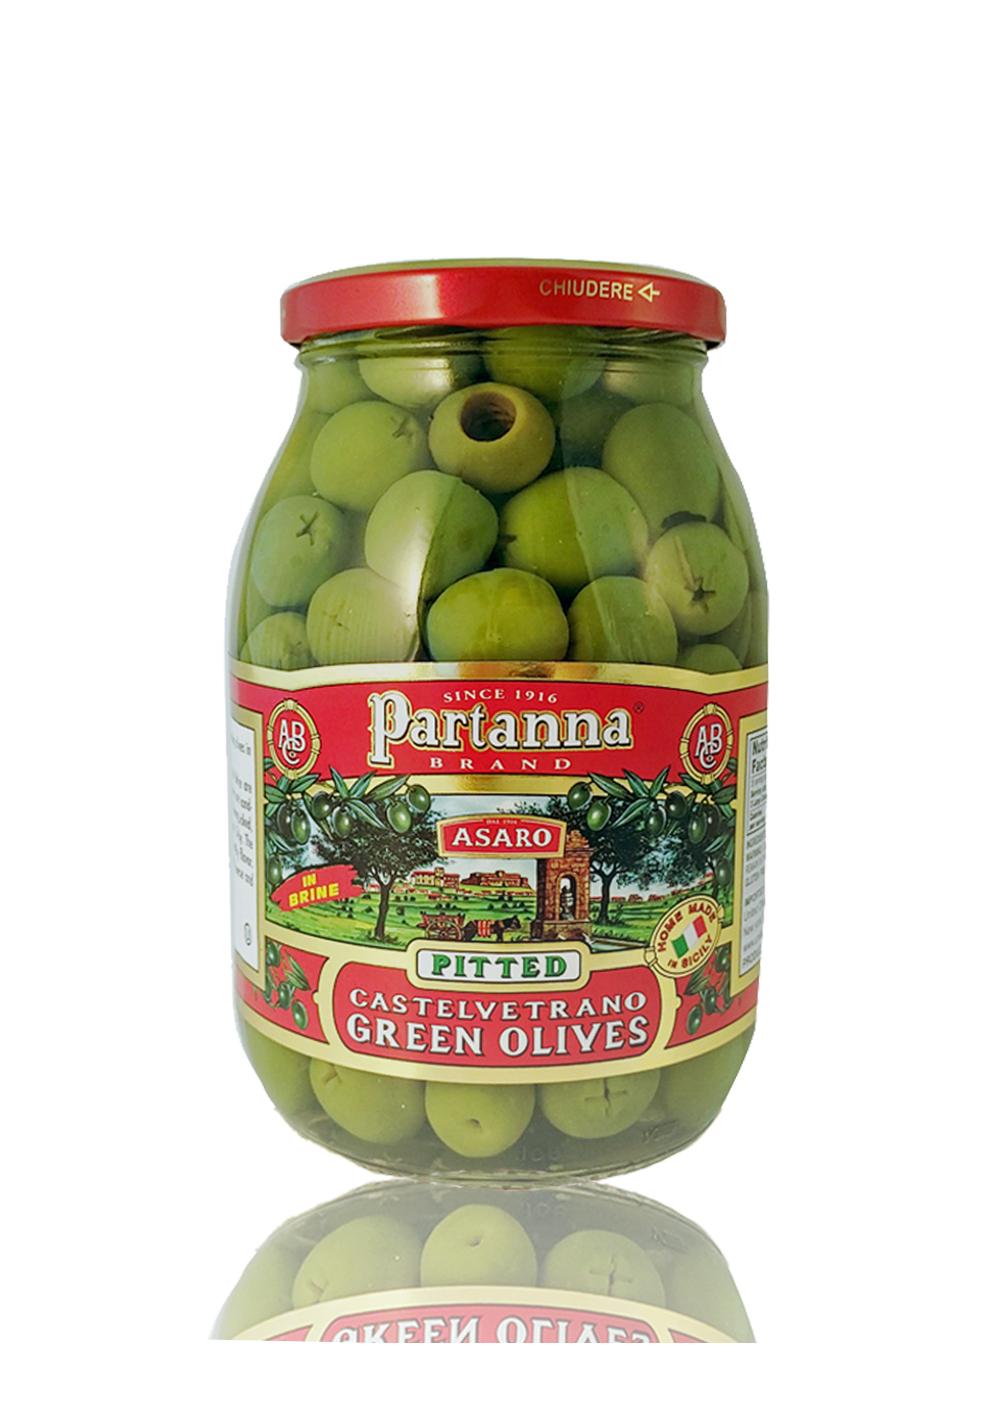 Partanna Castelvetrano Green Pitted Olives